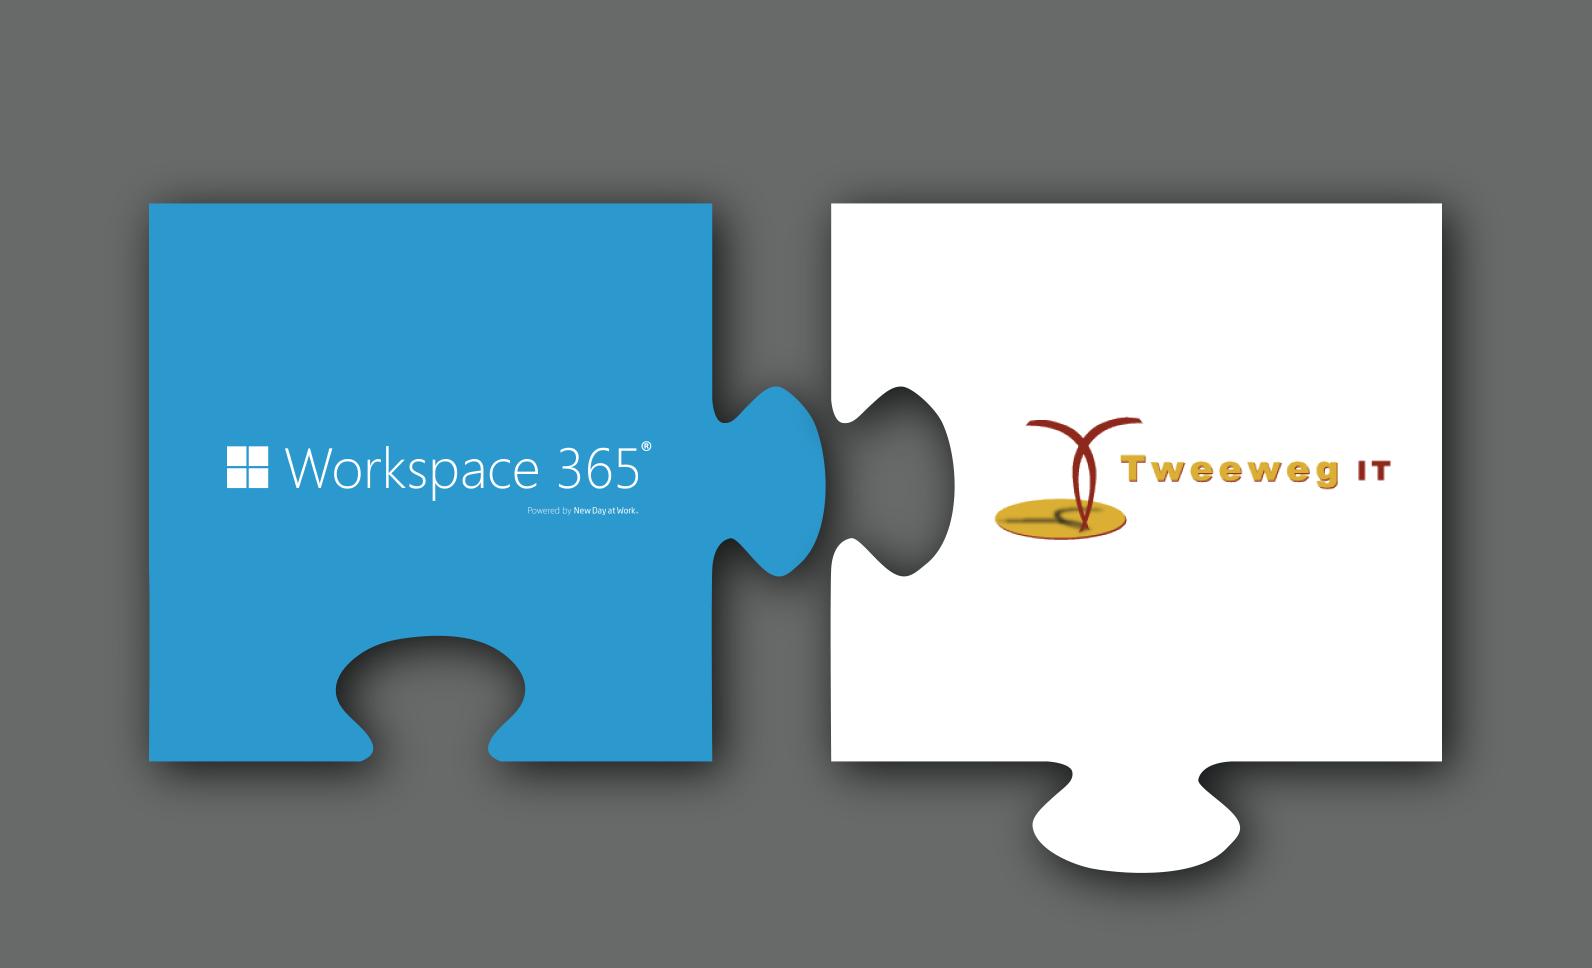 Tweeweg IT Workspace 365 partner